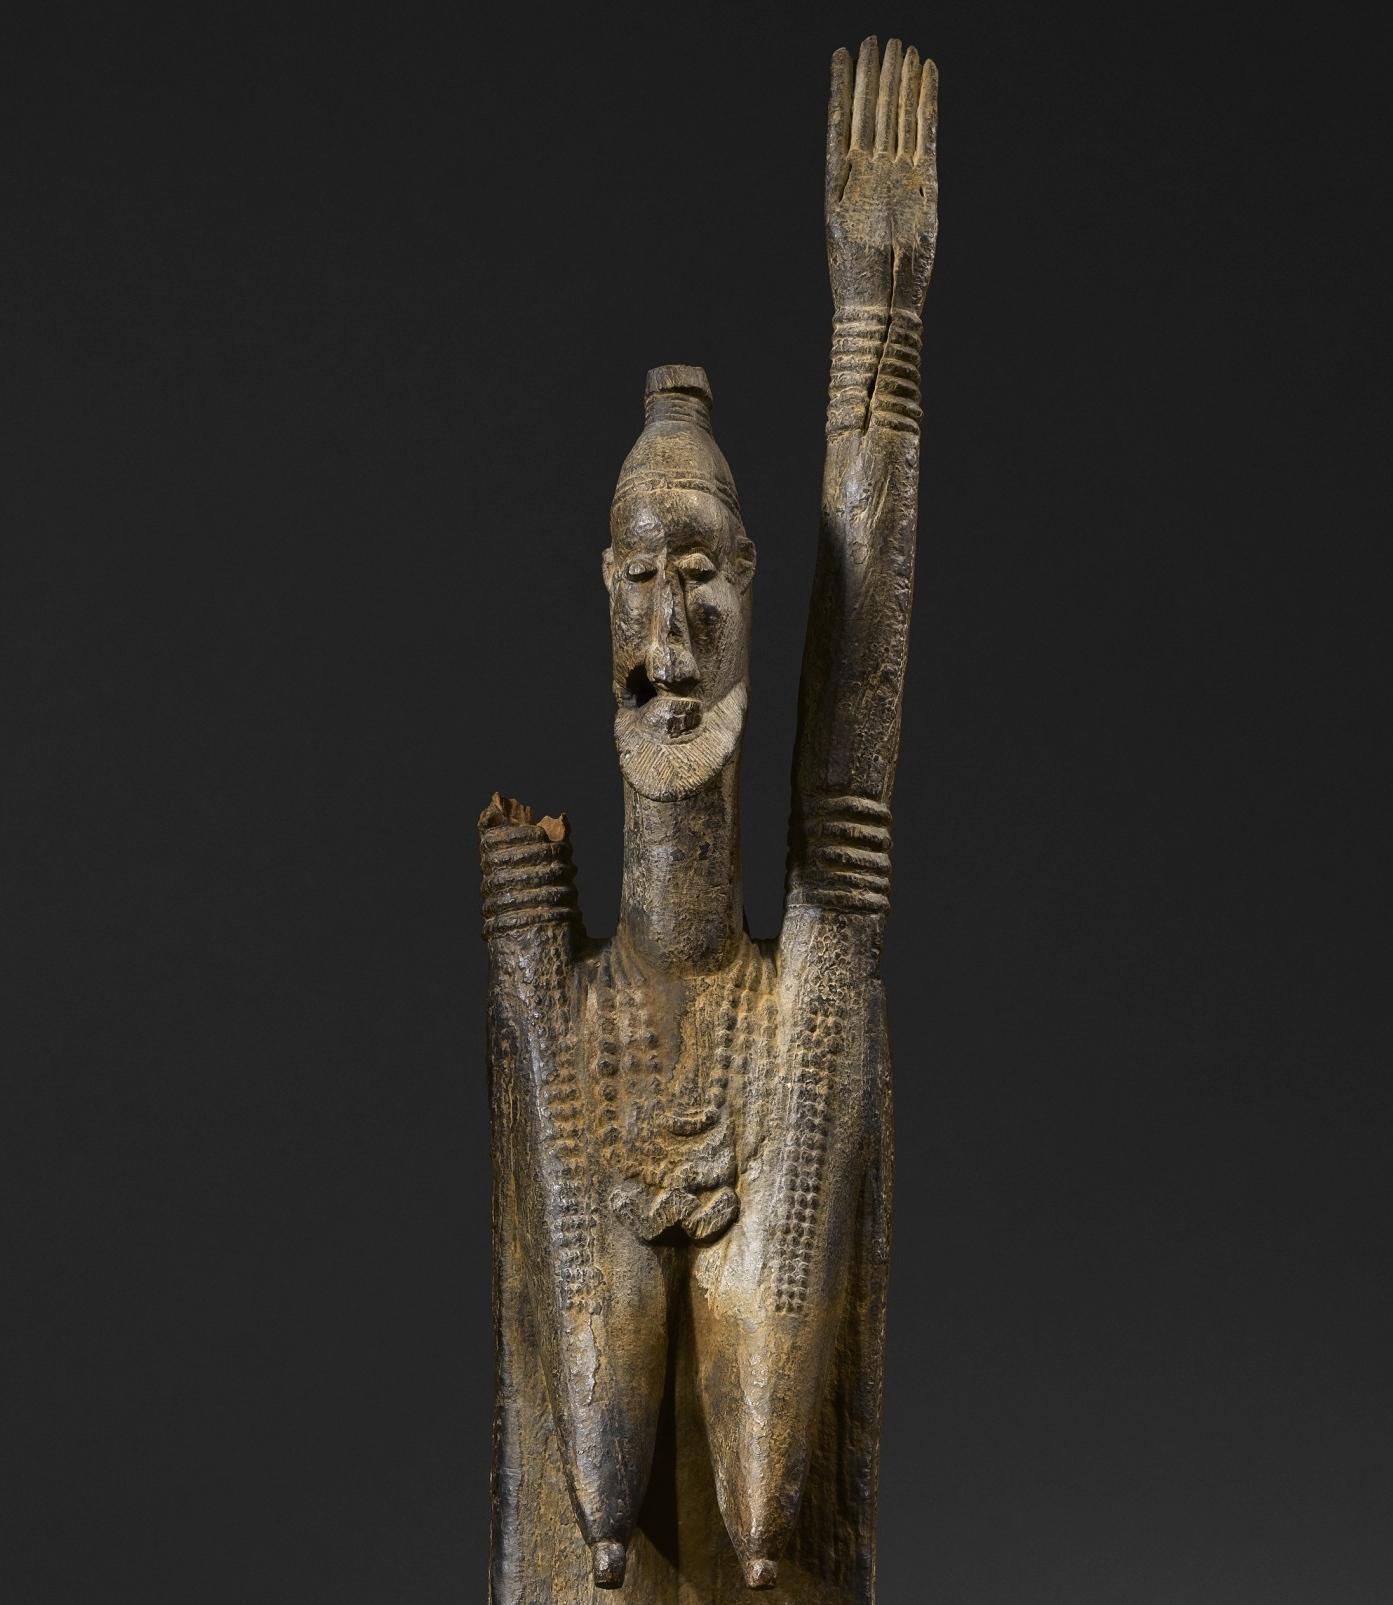 Musée du Quai Branly • Statue anthropomorphe